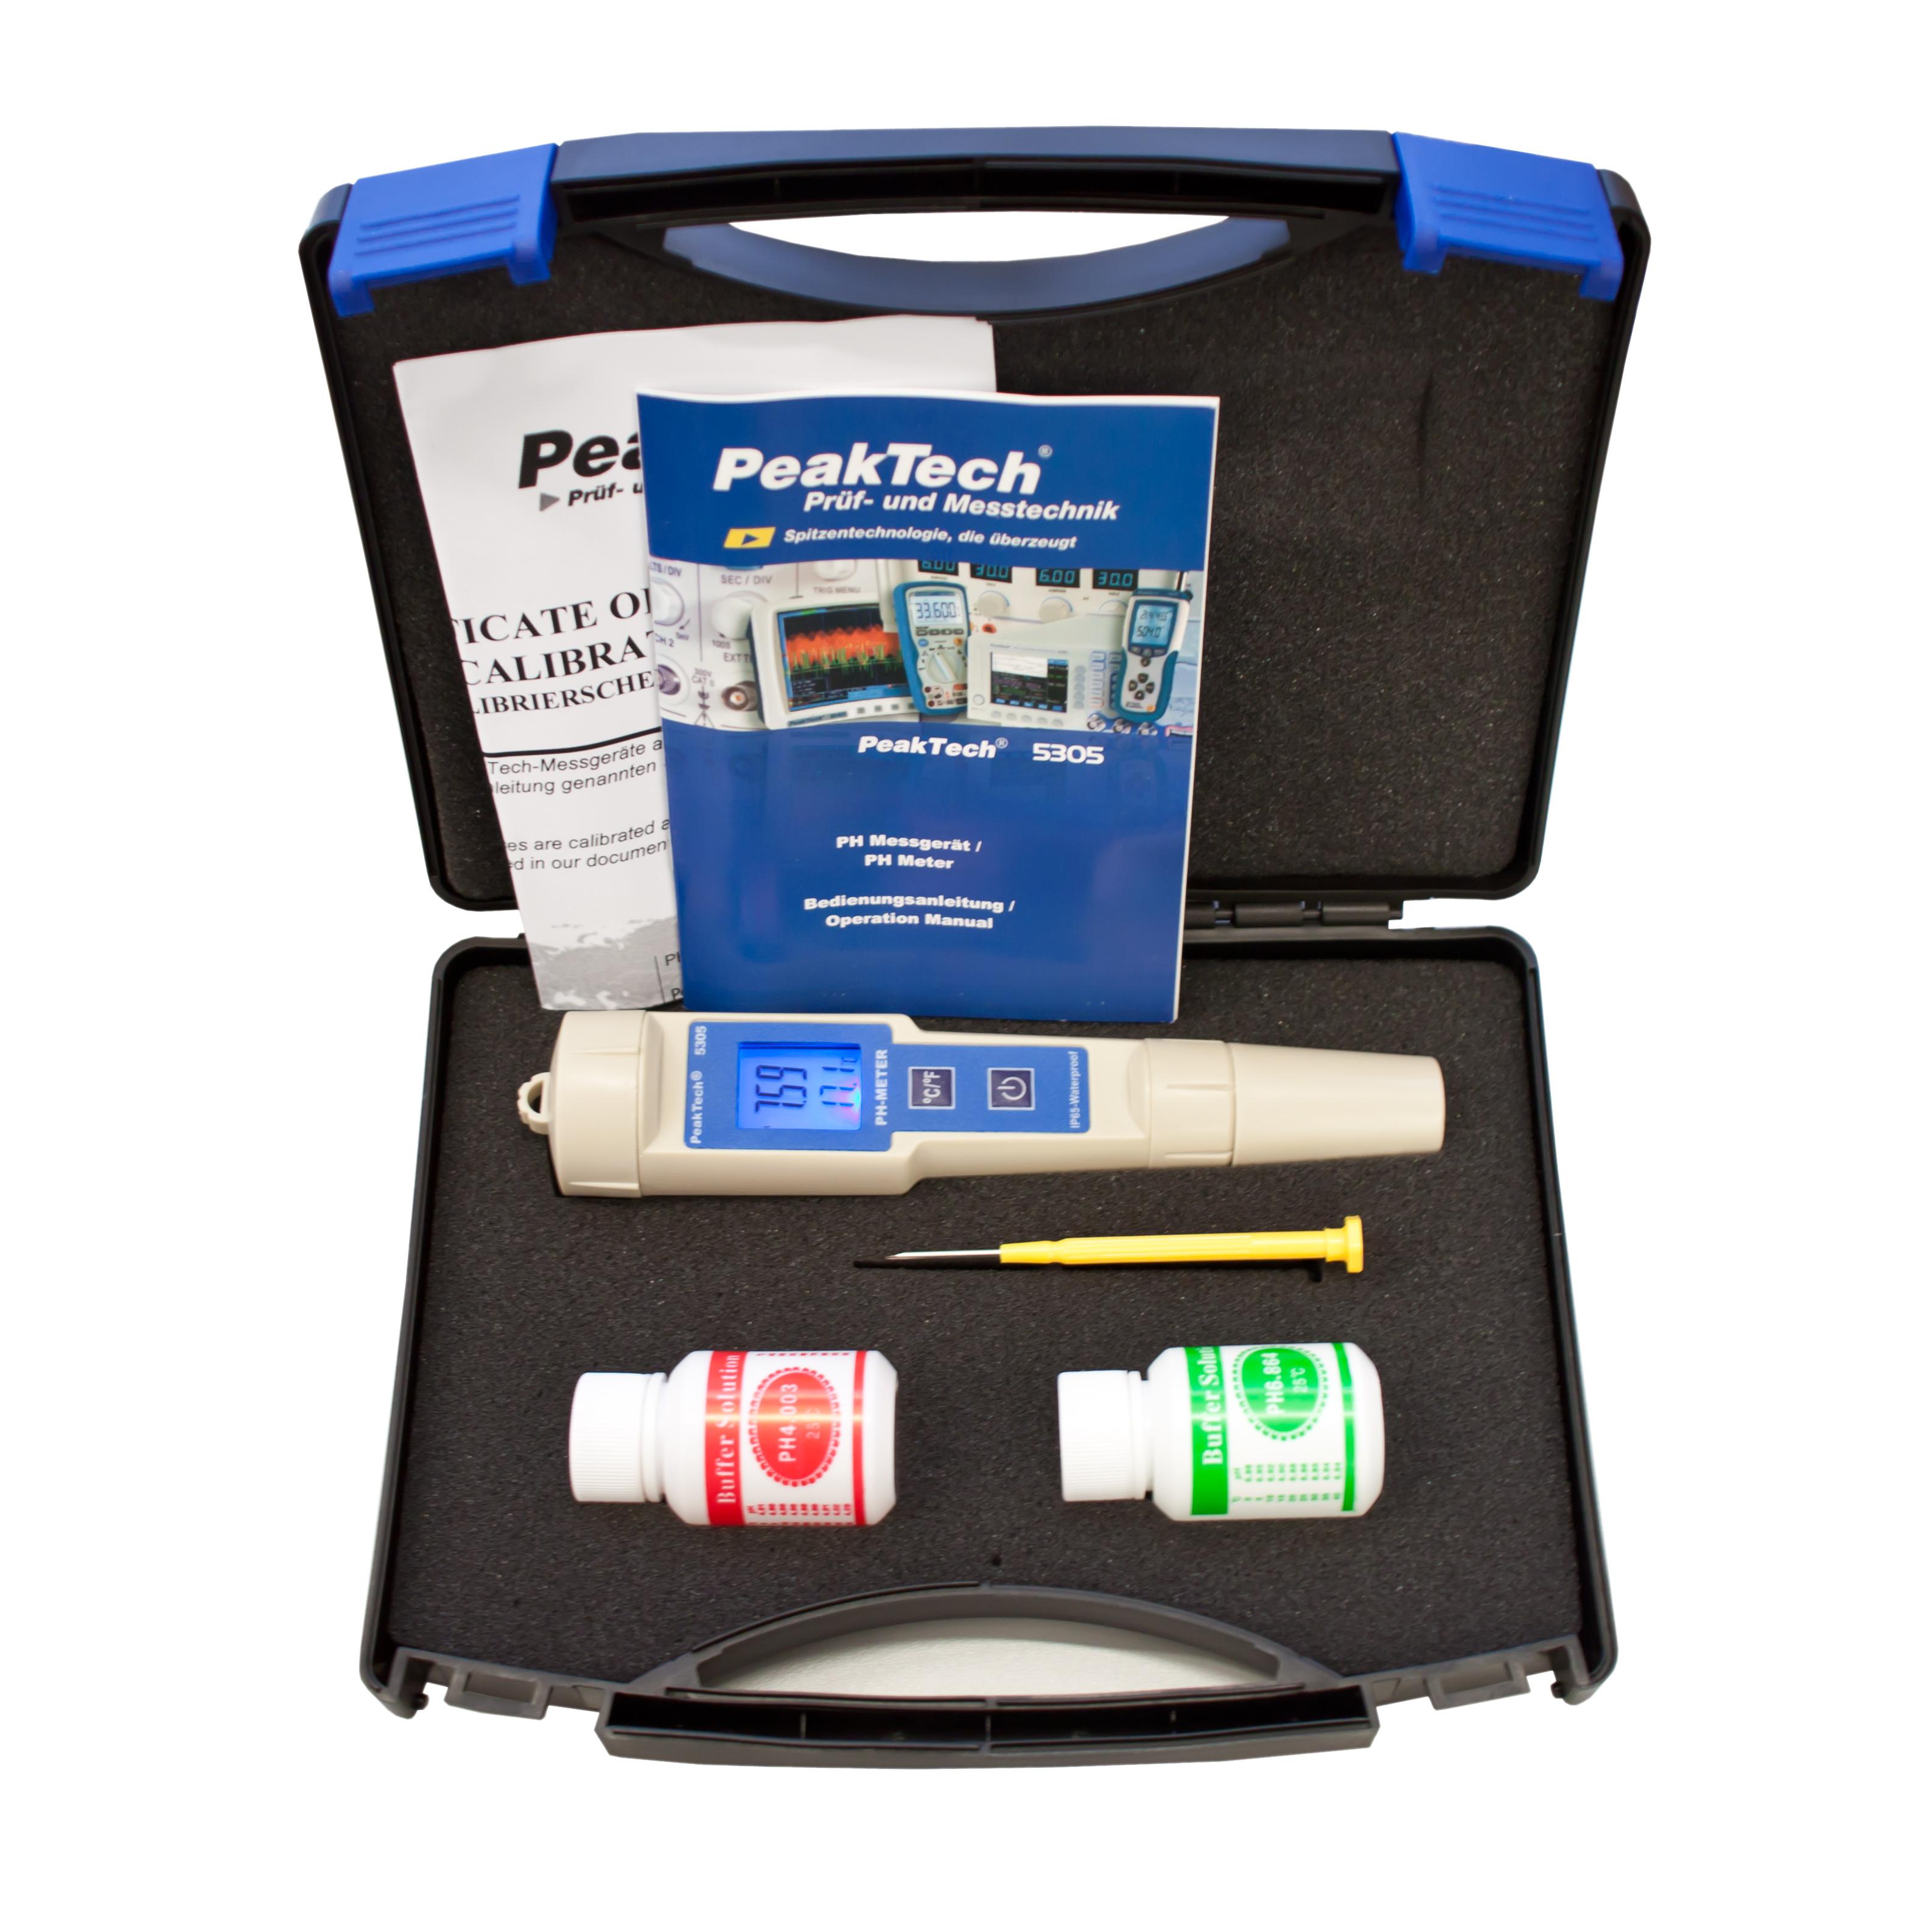 «PeakTech® P 5305» 2 in 1 PH-Meter